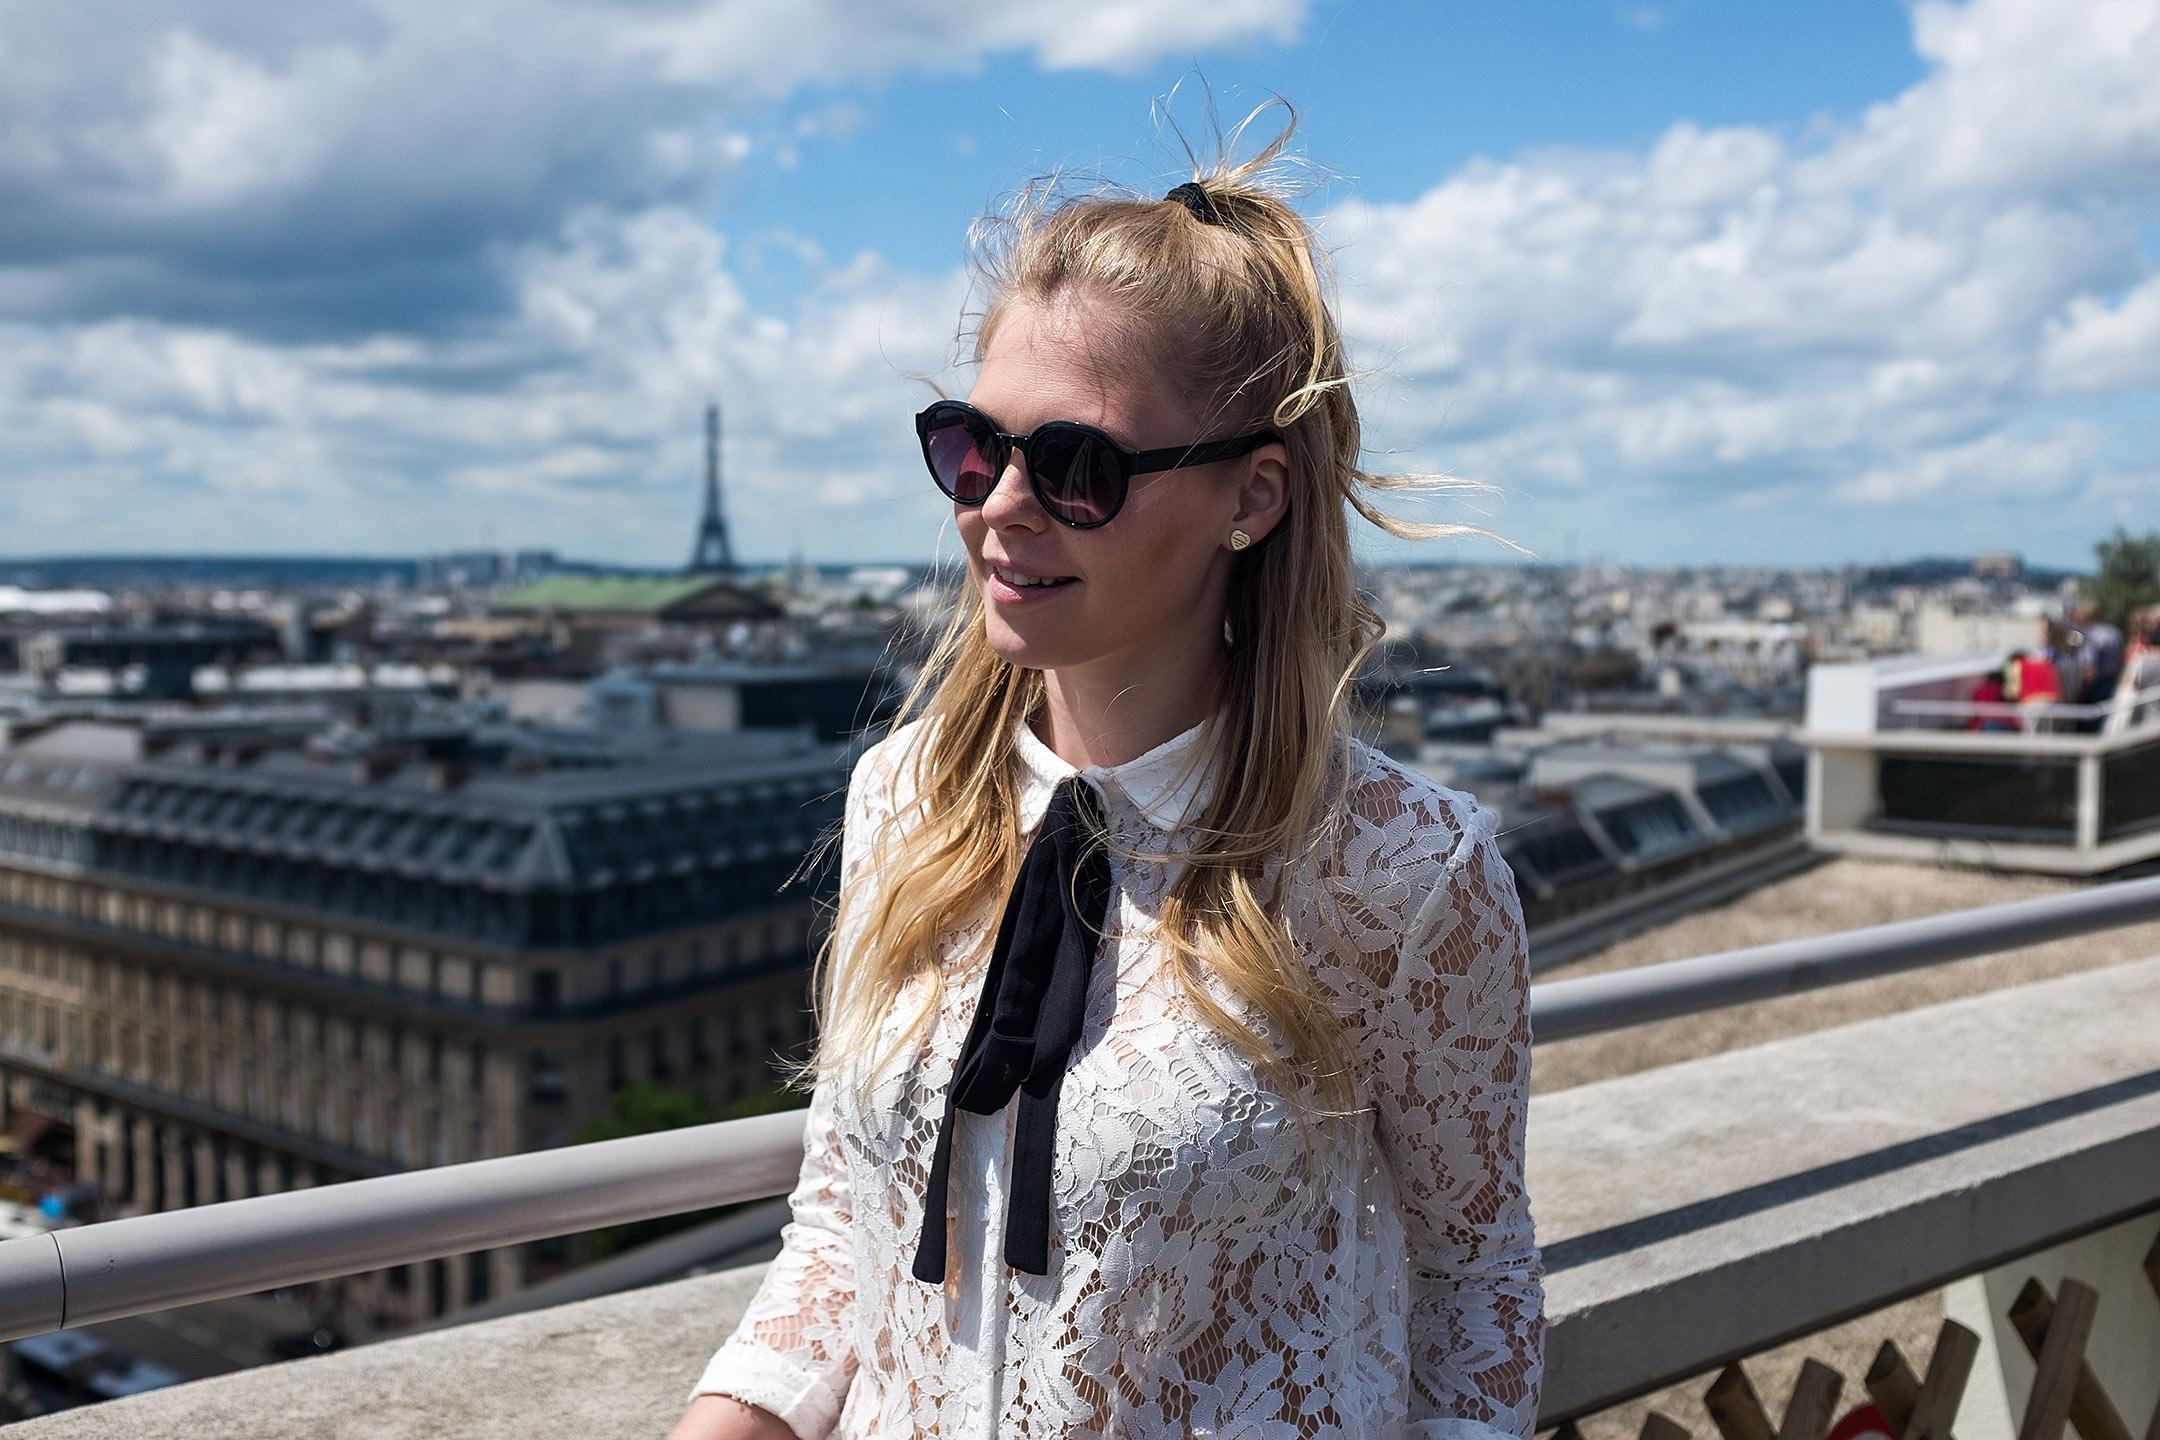 paris-galeries-lafayette-terrasse-travelblog-sunnyinga